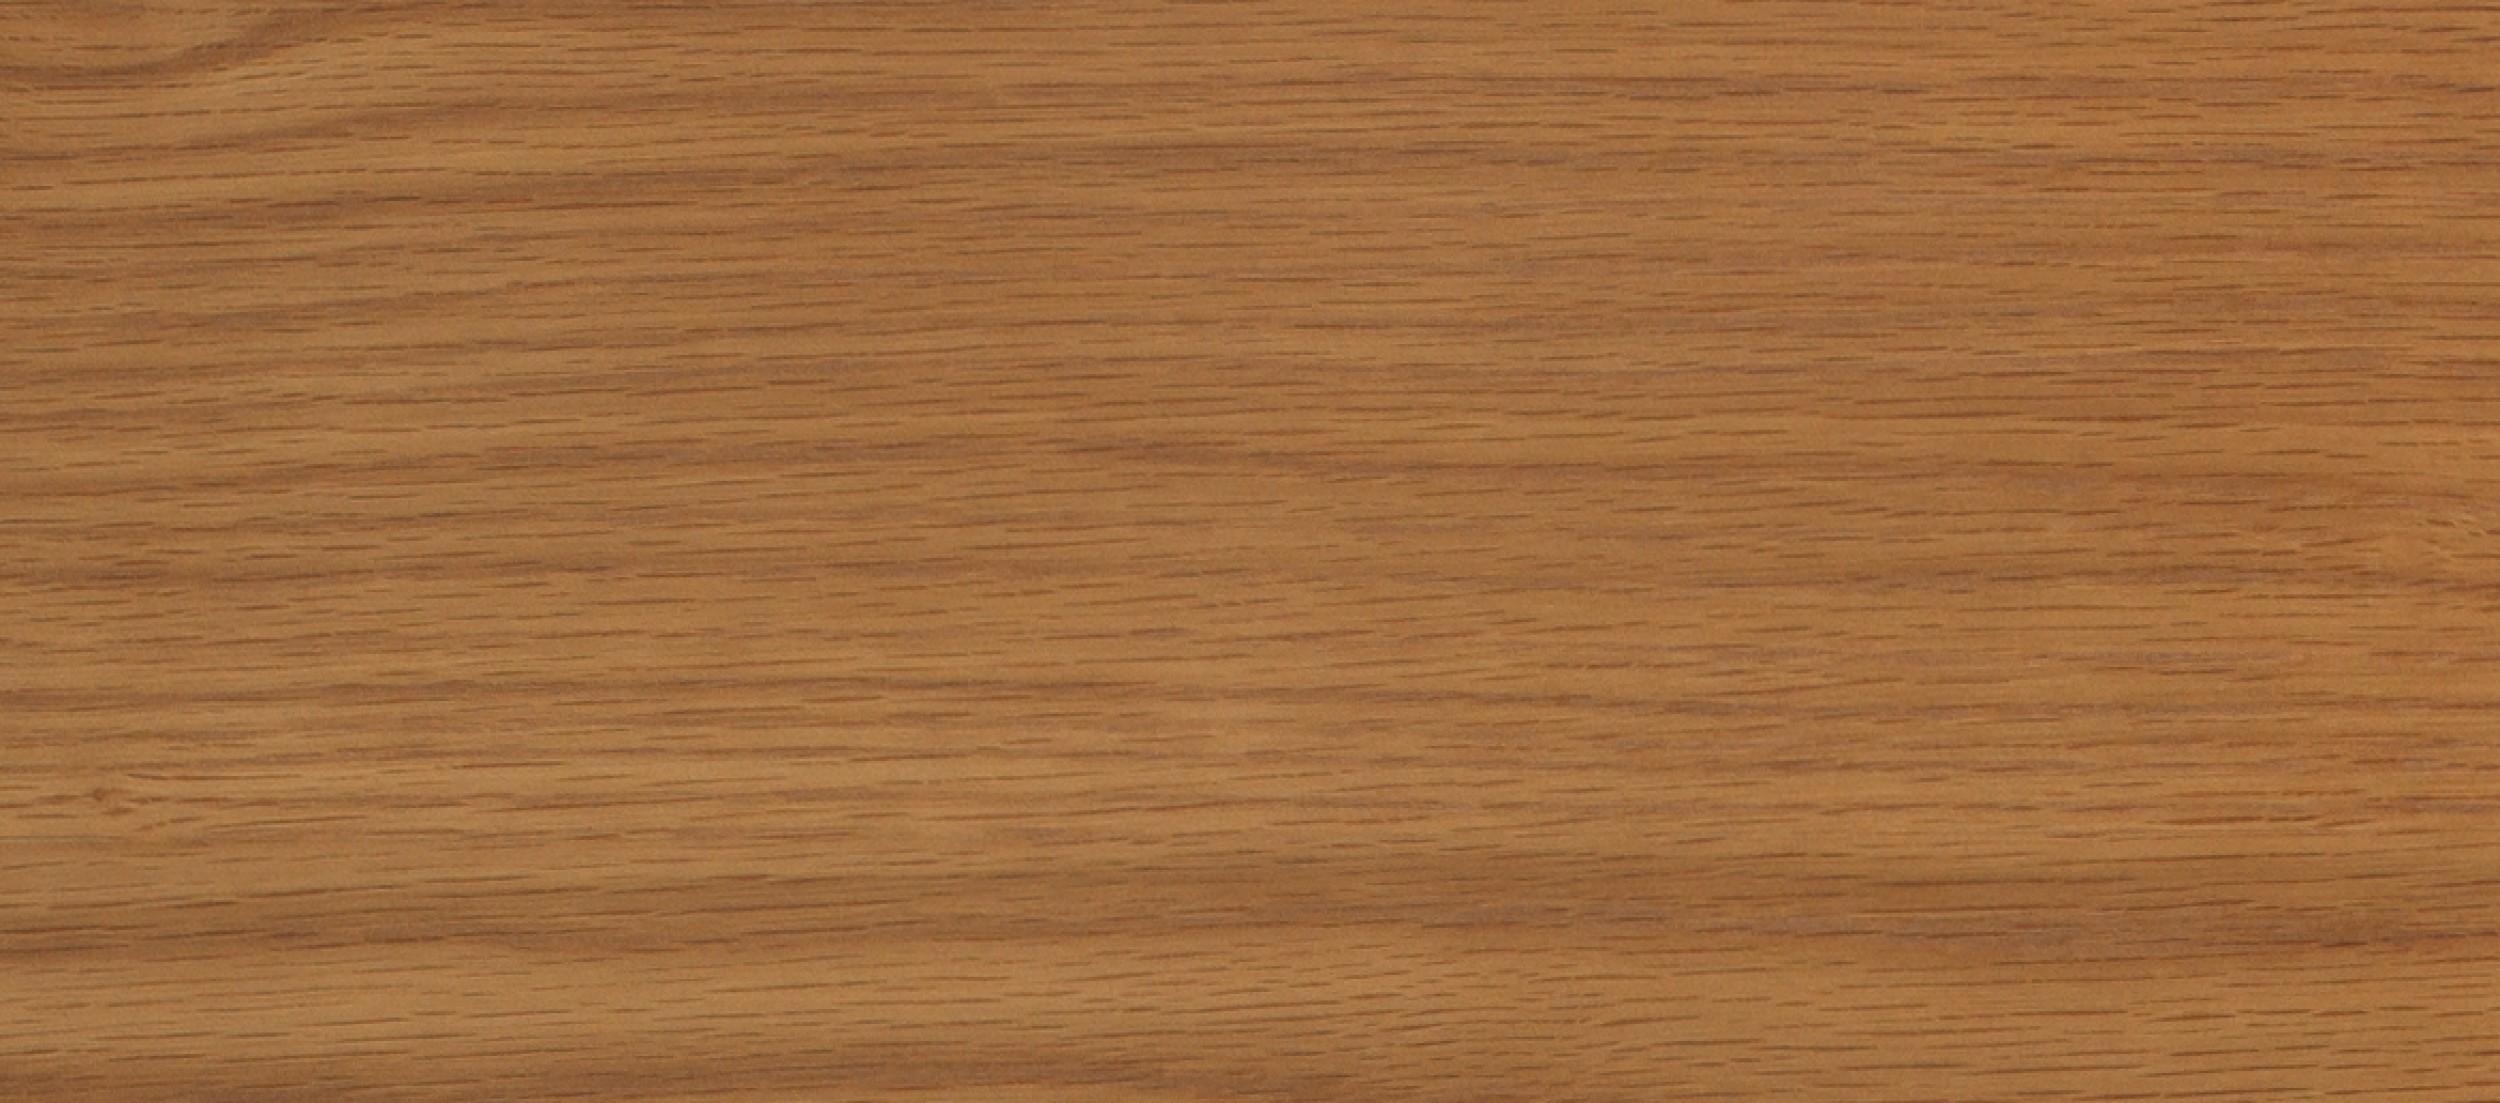 Rustic Oak Blanket Box Quercus Living : rustic oak wood grain33 from quercusliving.co.uk size 2500 x 1103 jpeg 471kB